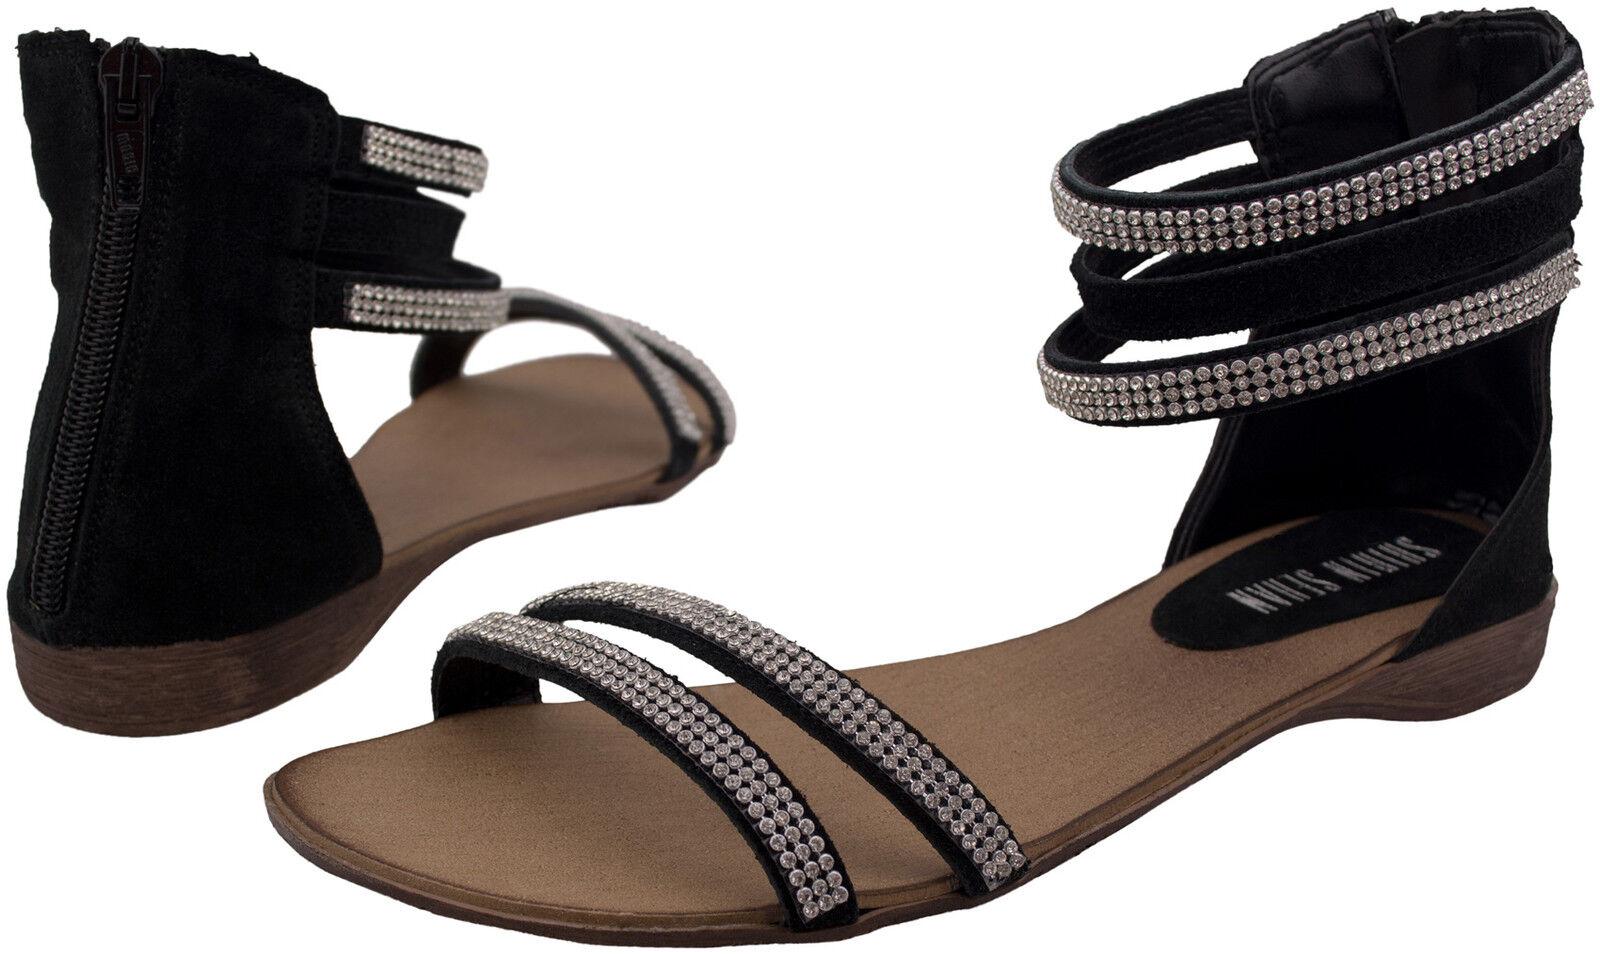 Cuero sandalias negro Swarovski elementos sandals Flat Leather negro